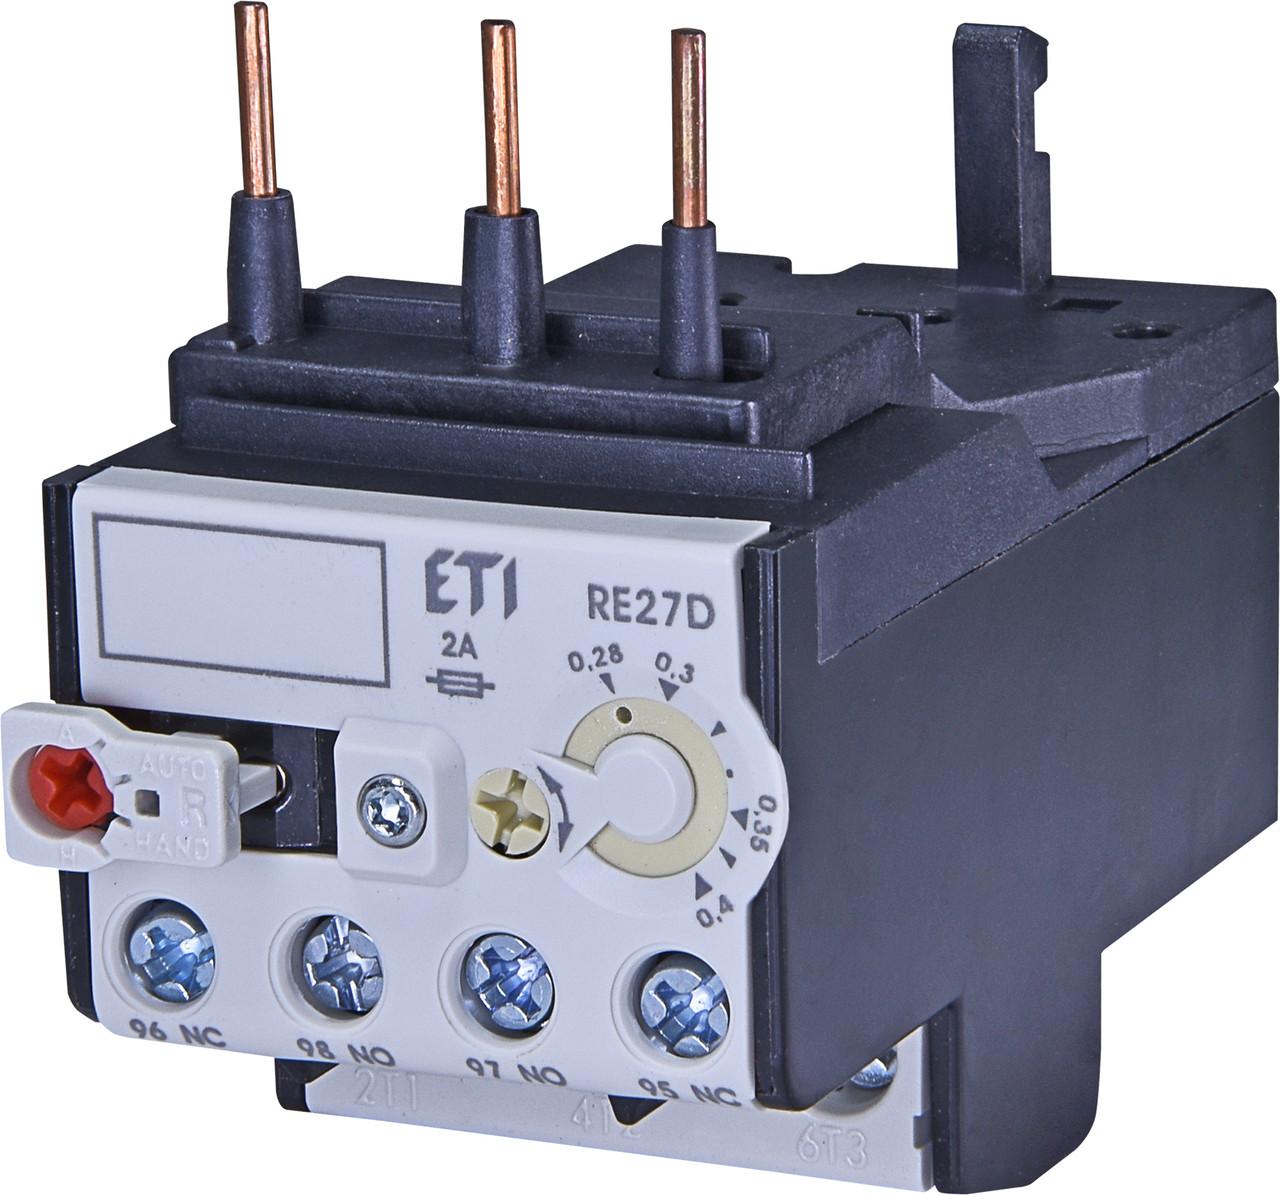 Тепловое реле ETI RE 27D-0,4 (0,28-0,4A) CEM9-CEM25 4642400 (для контакторов CEM9, CEM12, CEM18, CEM25)